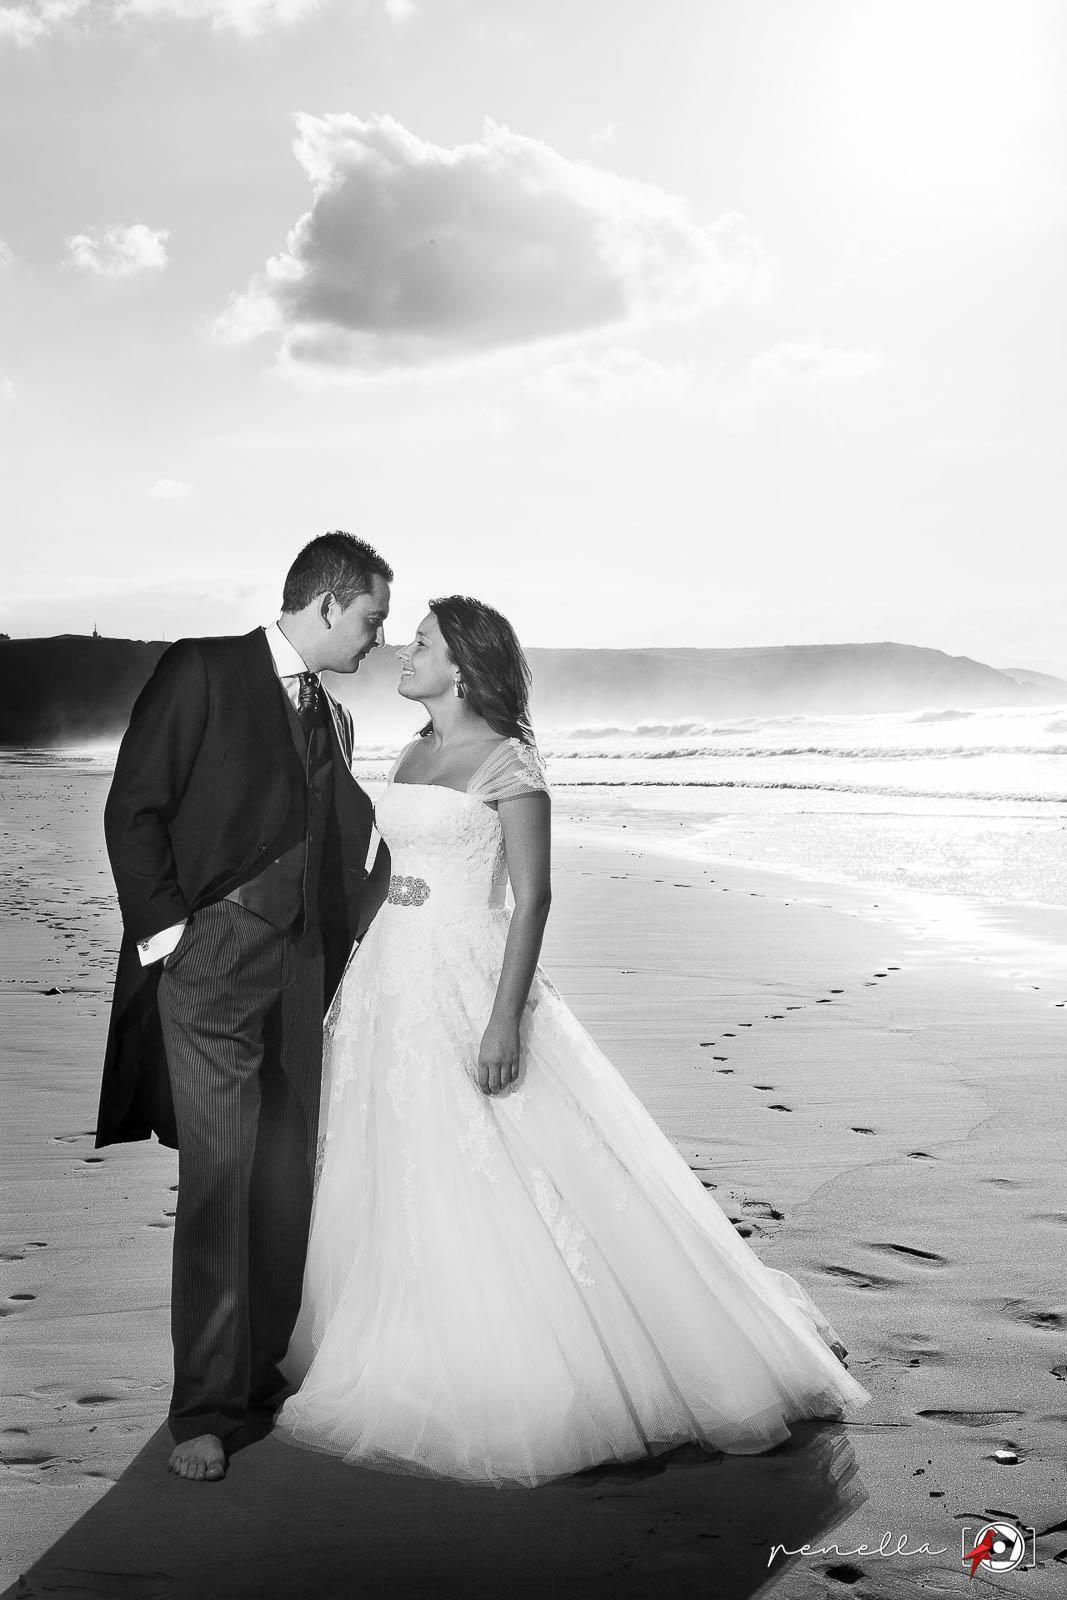 Reportaje de bodas en Asturias, Gijón, Avilés y Oviedo de la fotógrafa Penella Fotografía